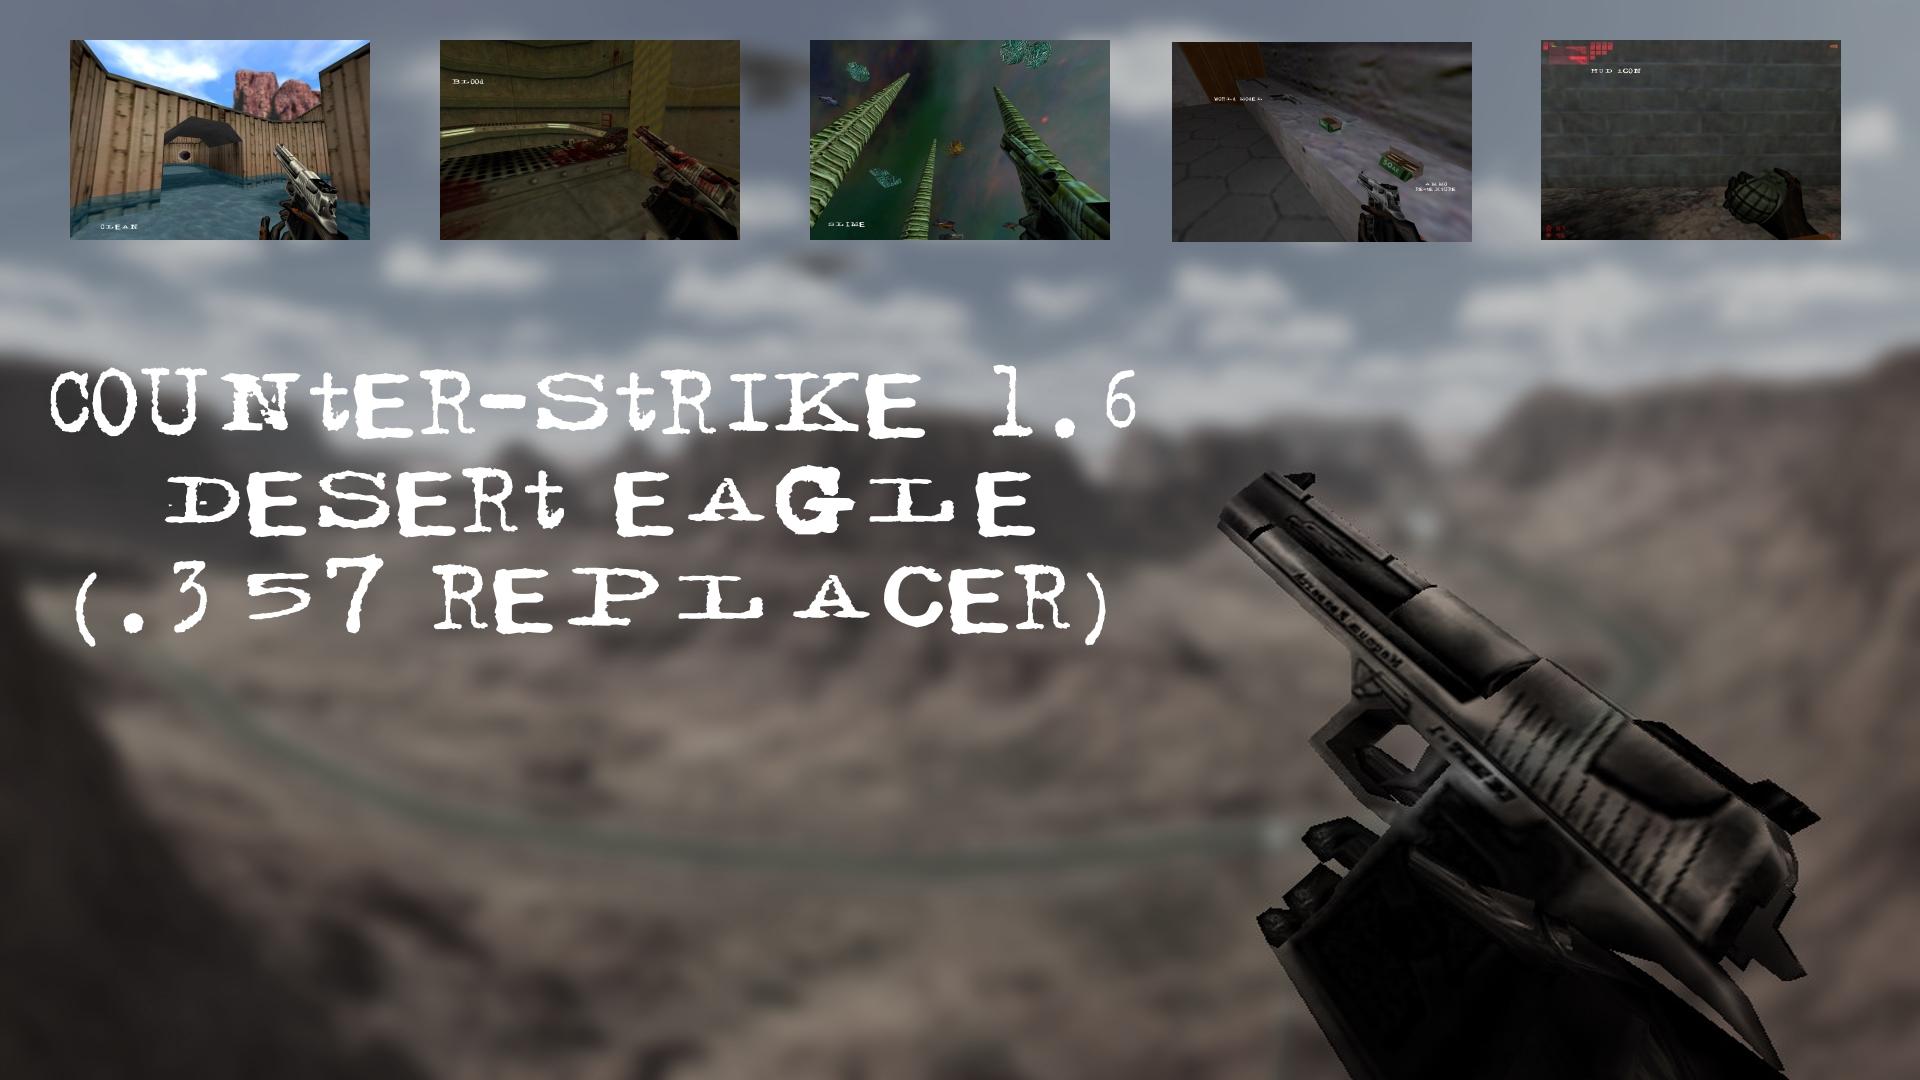 Counter-Strike 1 6 Desert Eagle ( 357 replacer) addon